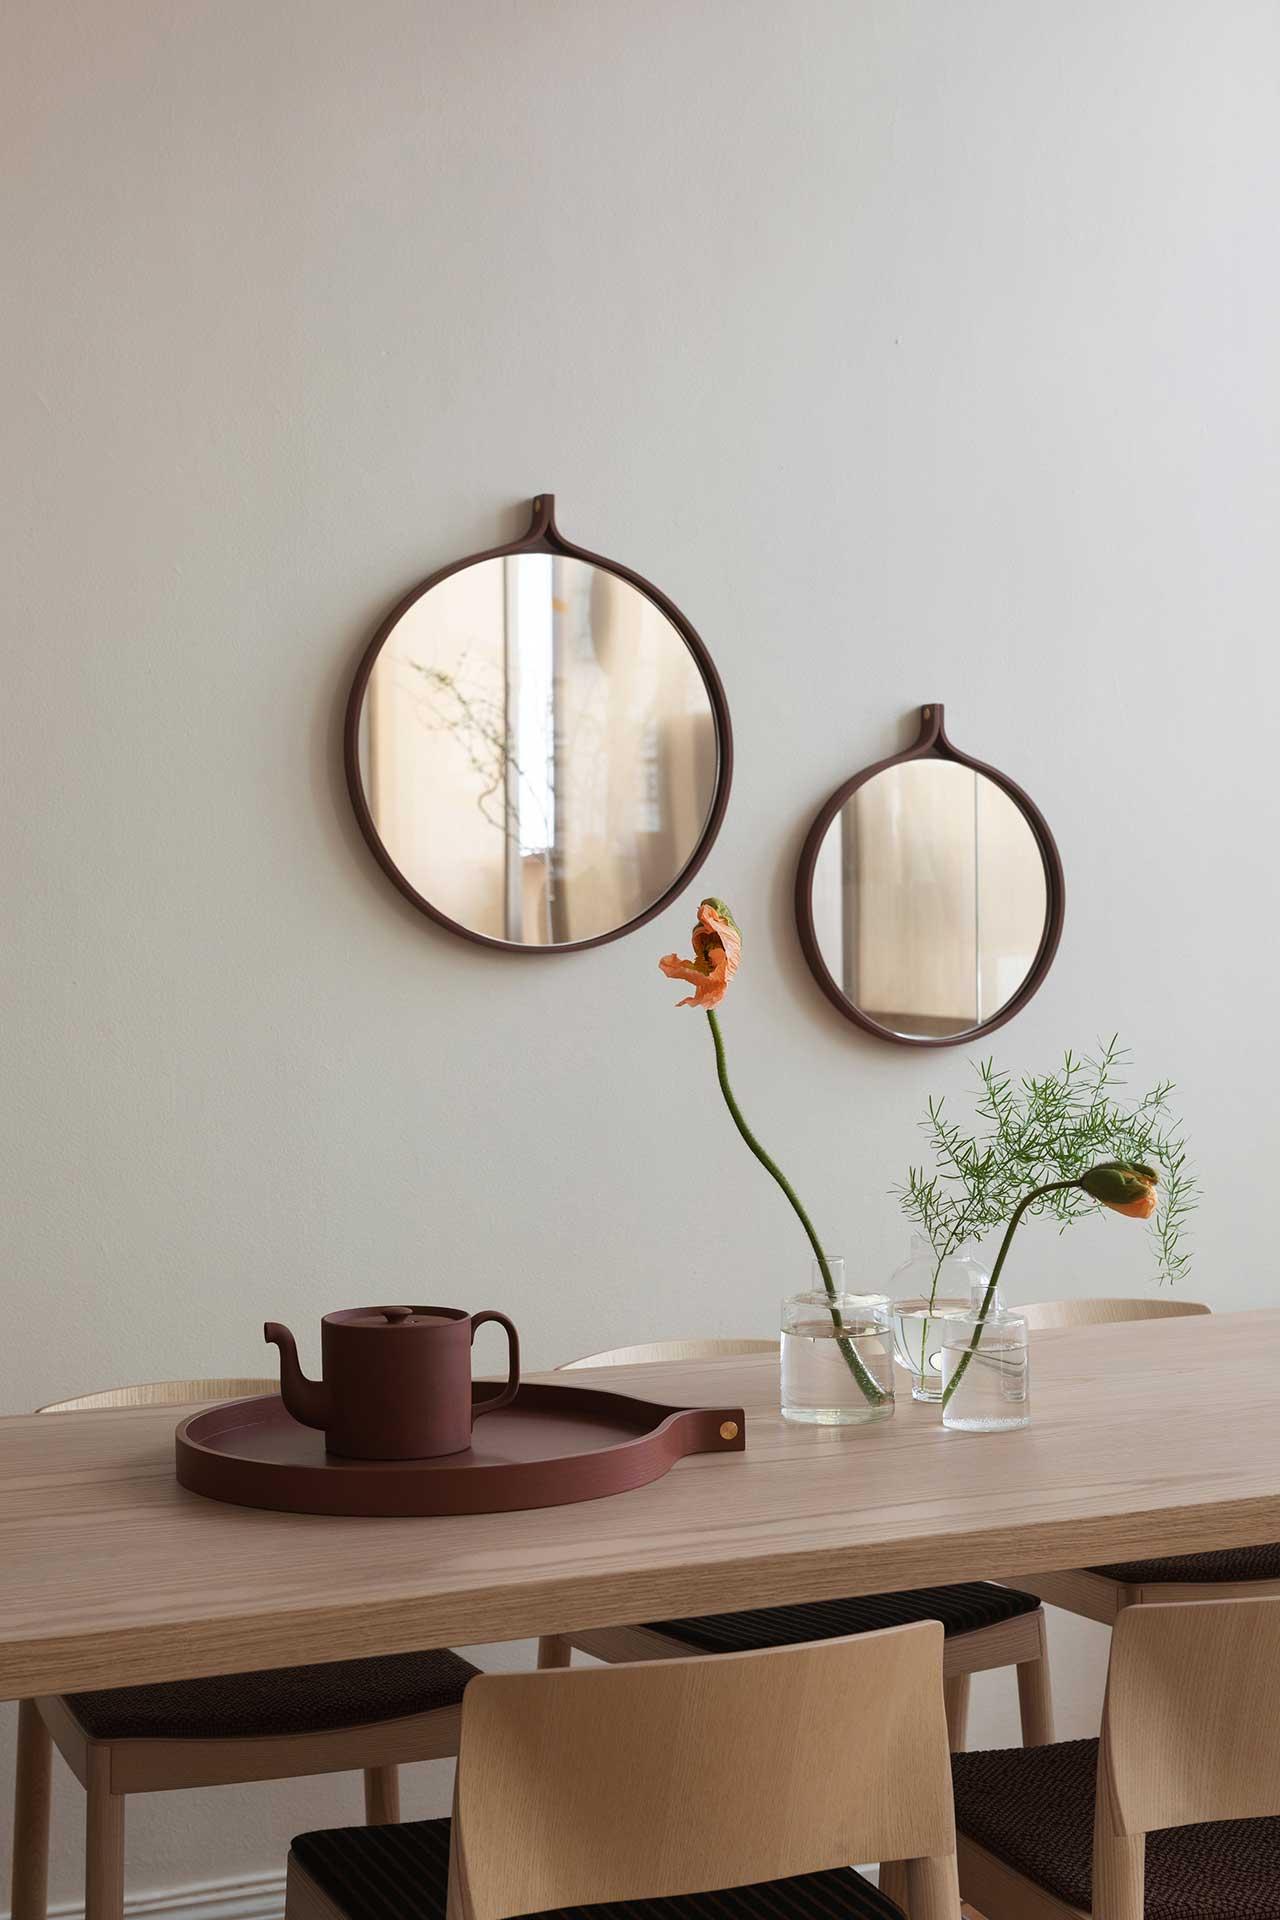 mirrors and tray